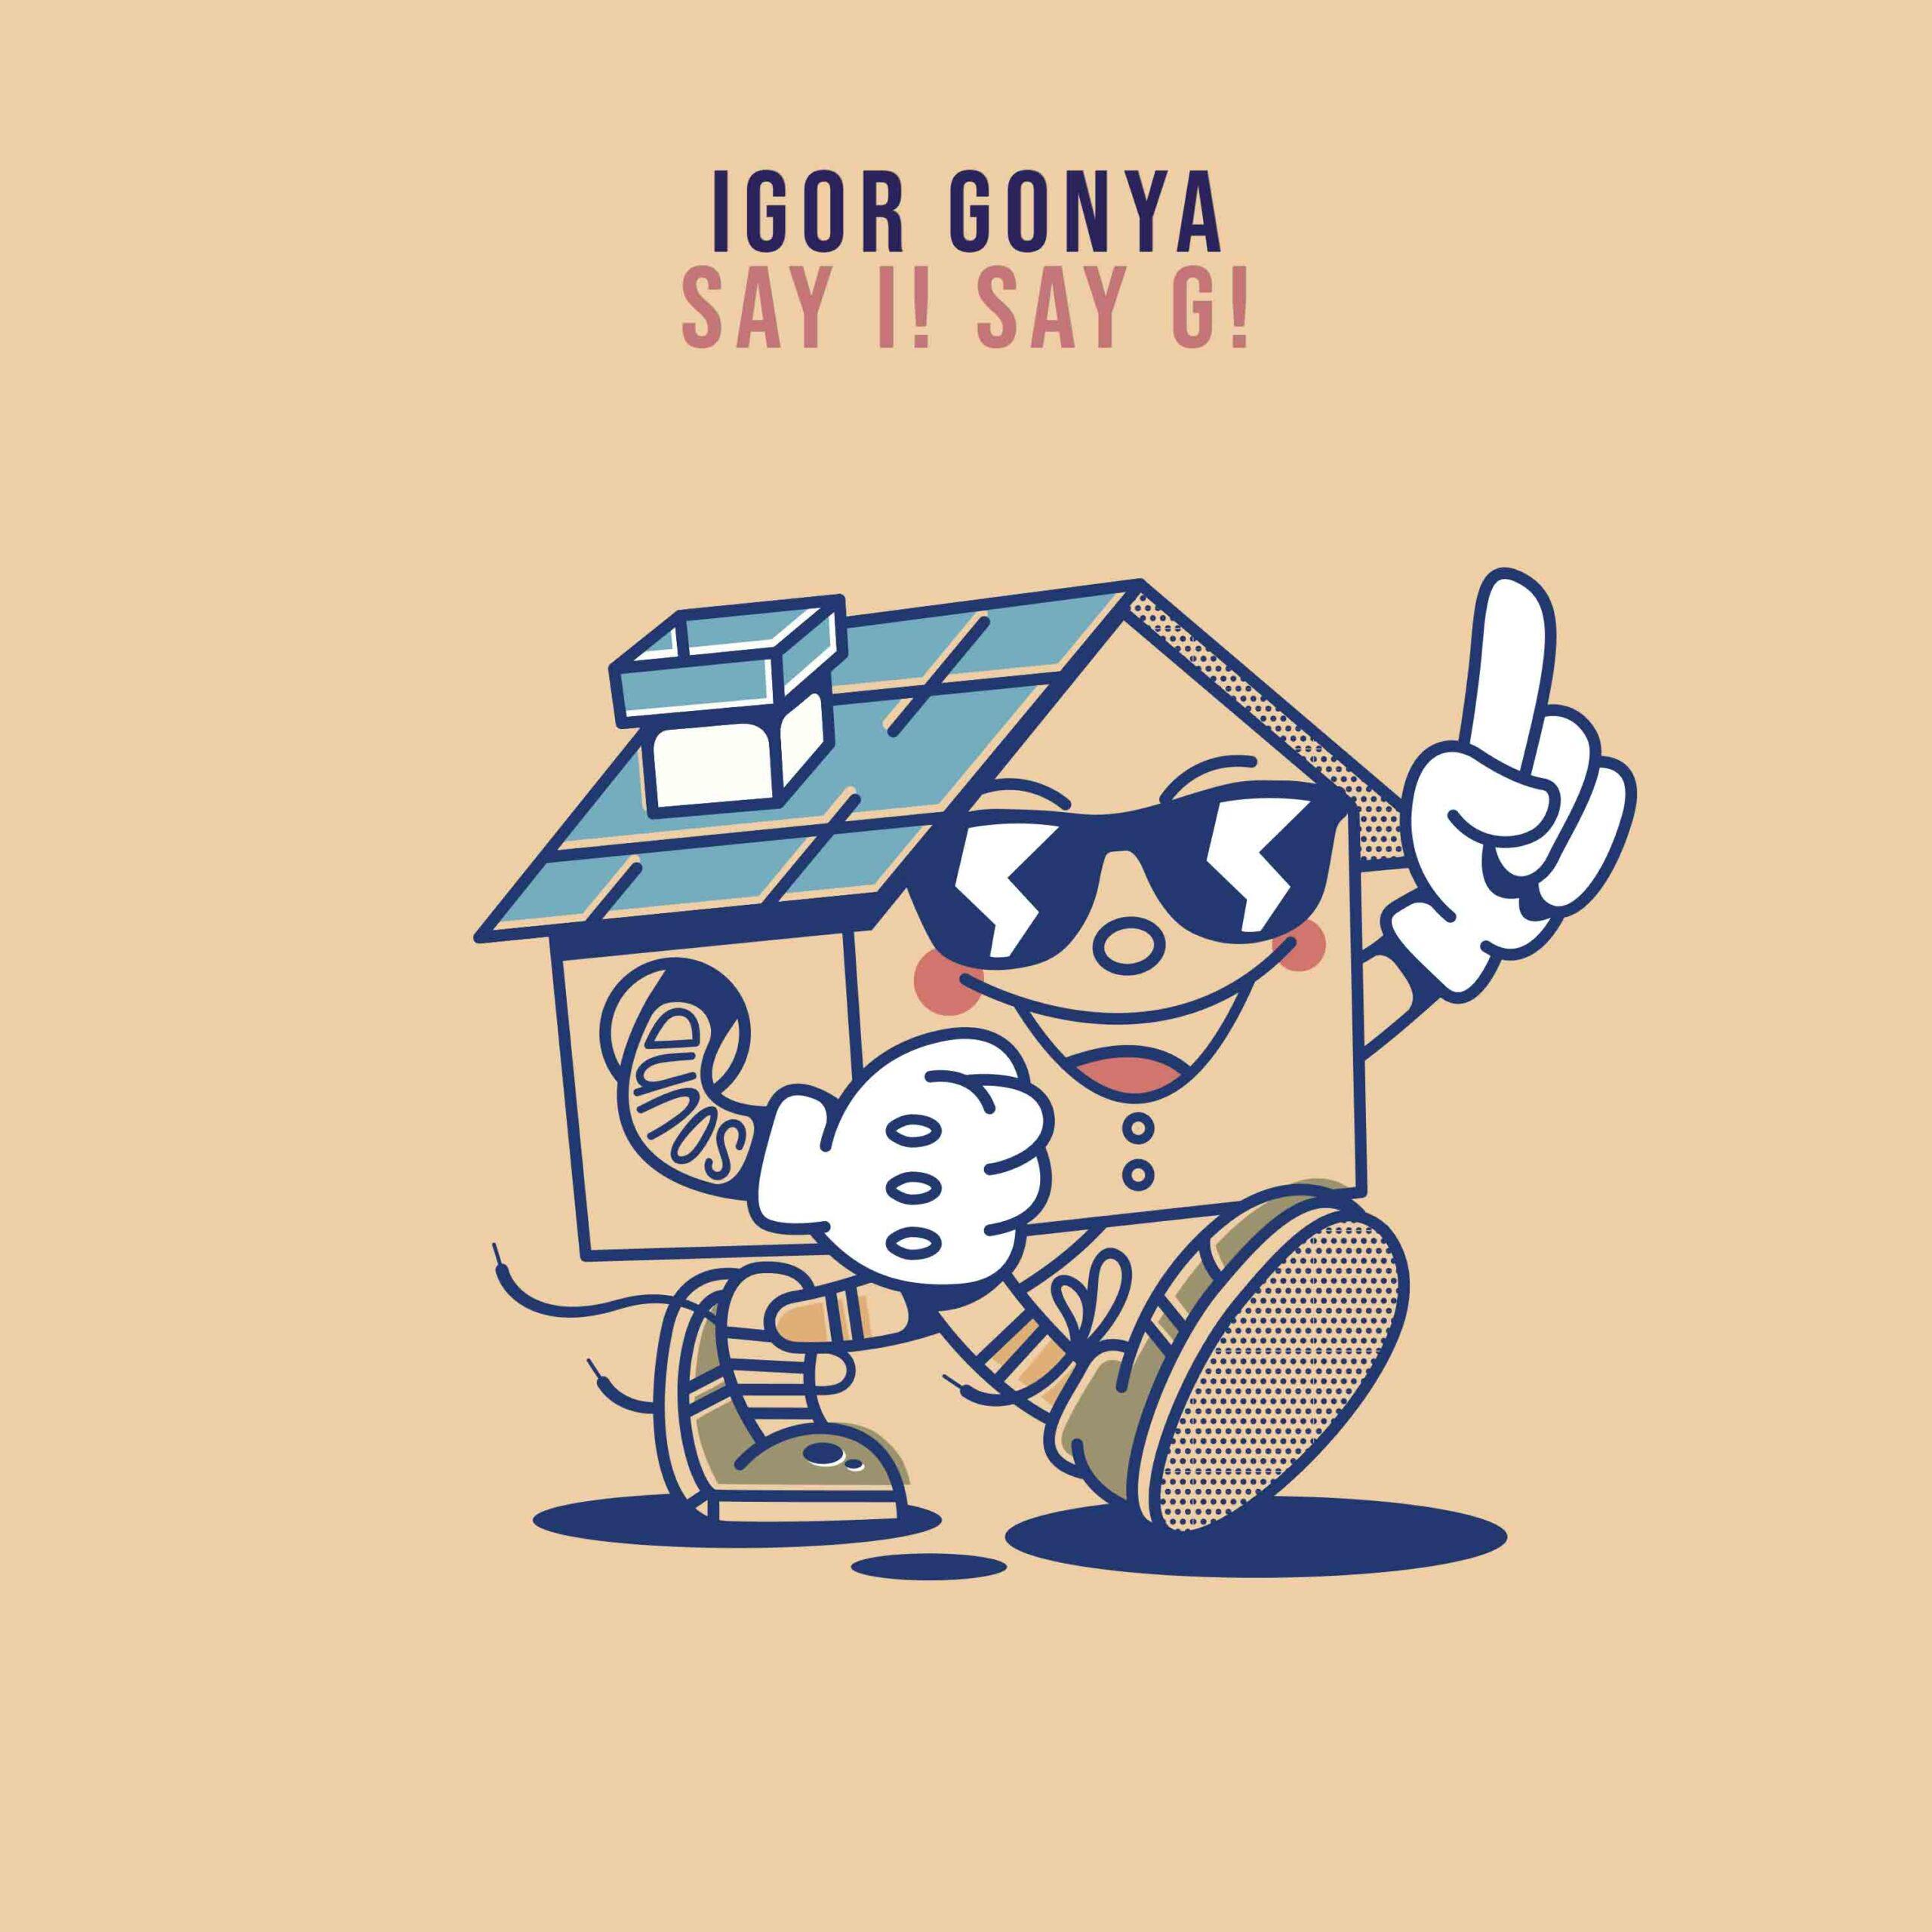 the-basement-thebasement-thebasementdiscos-igor-gonya-say-i-valencia-dj-disco-house-good-feelings-portada